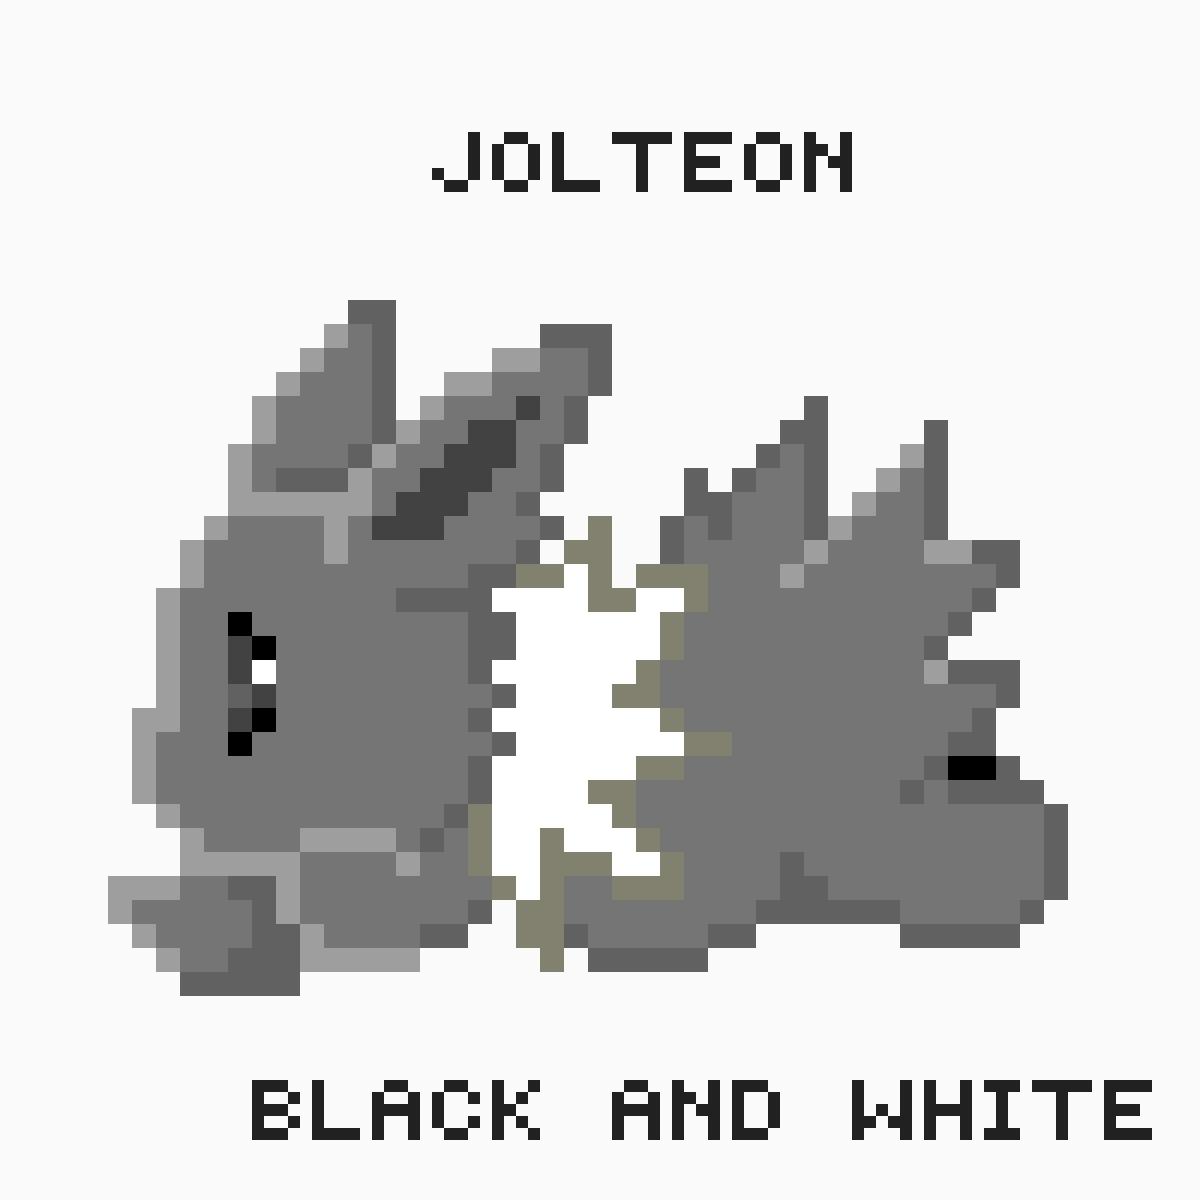 Black and white jolteon by Heihei